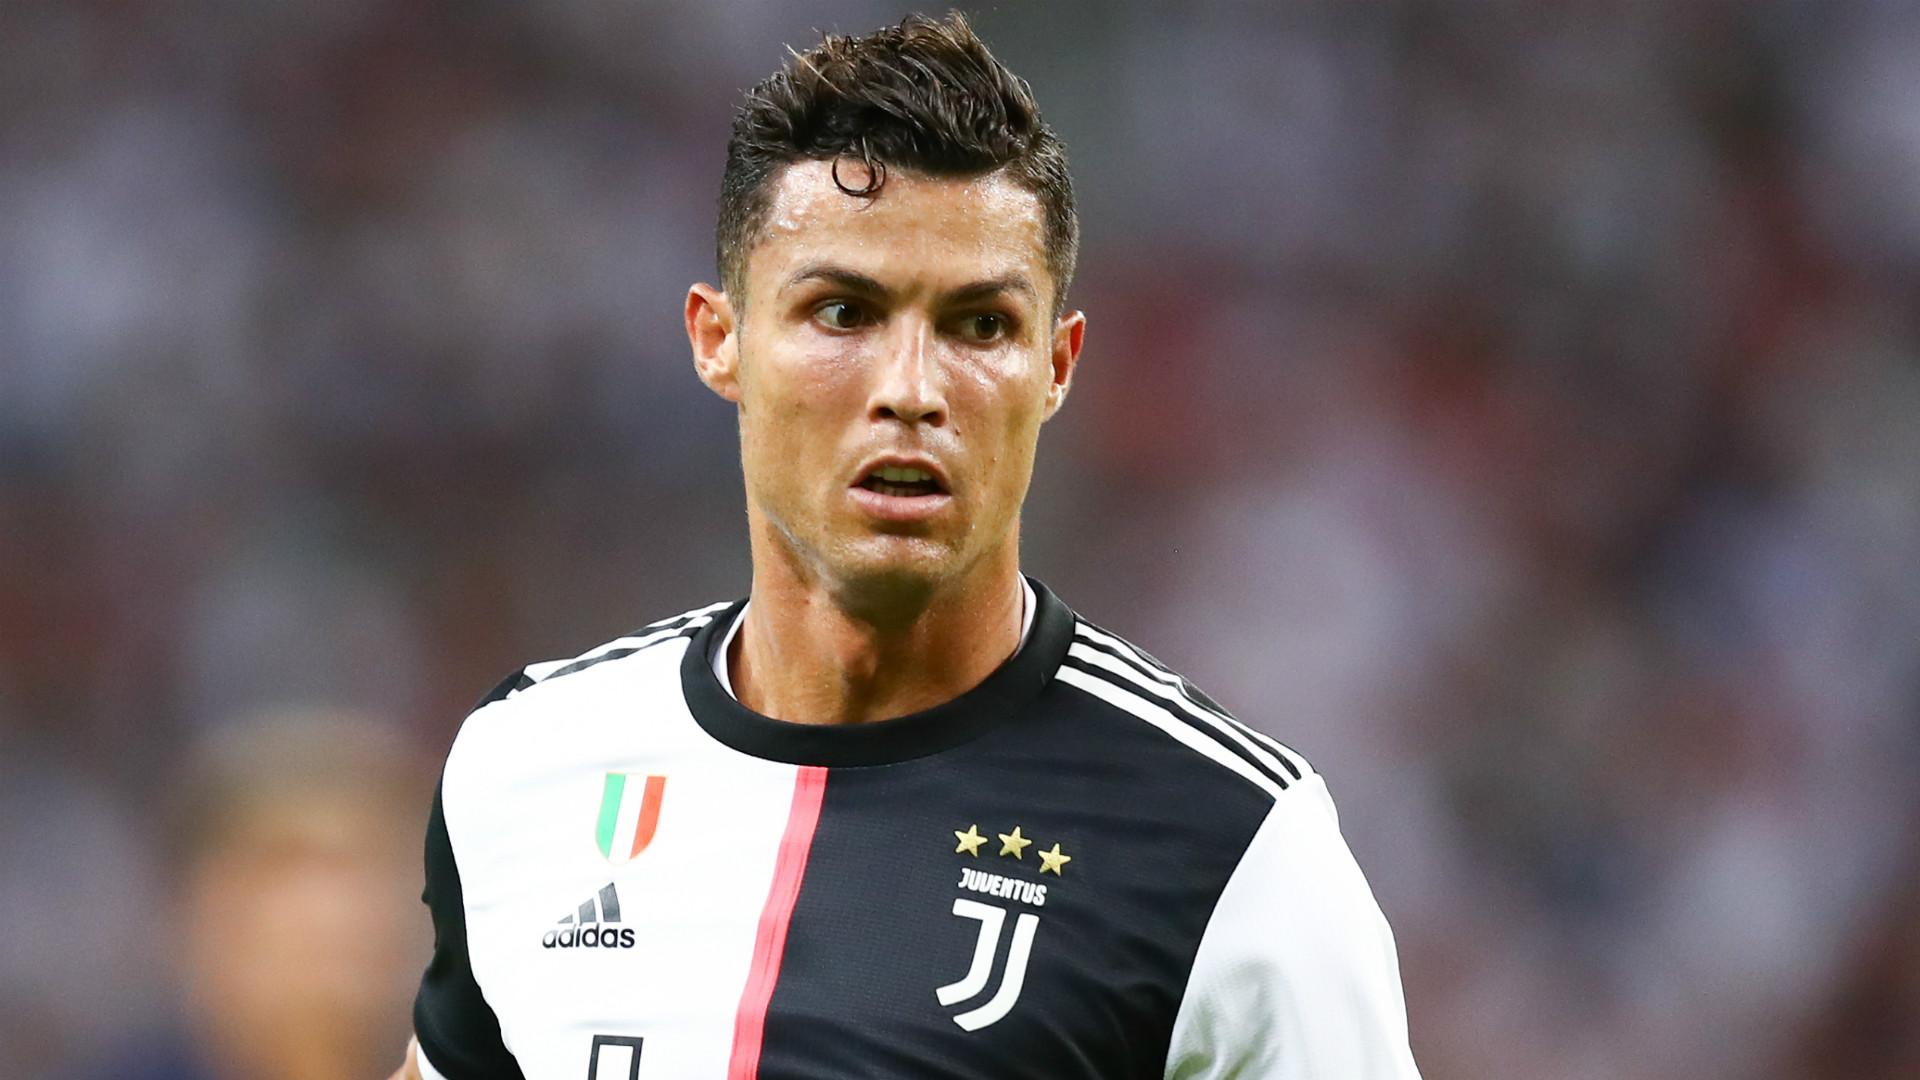 Juventus Turin Vs SSC Neapel Alles Zu TV Und LIVE STREAM